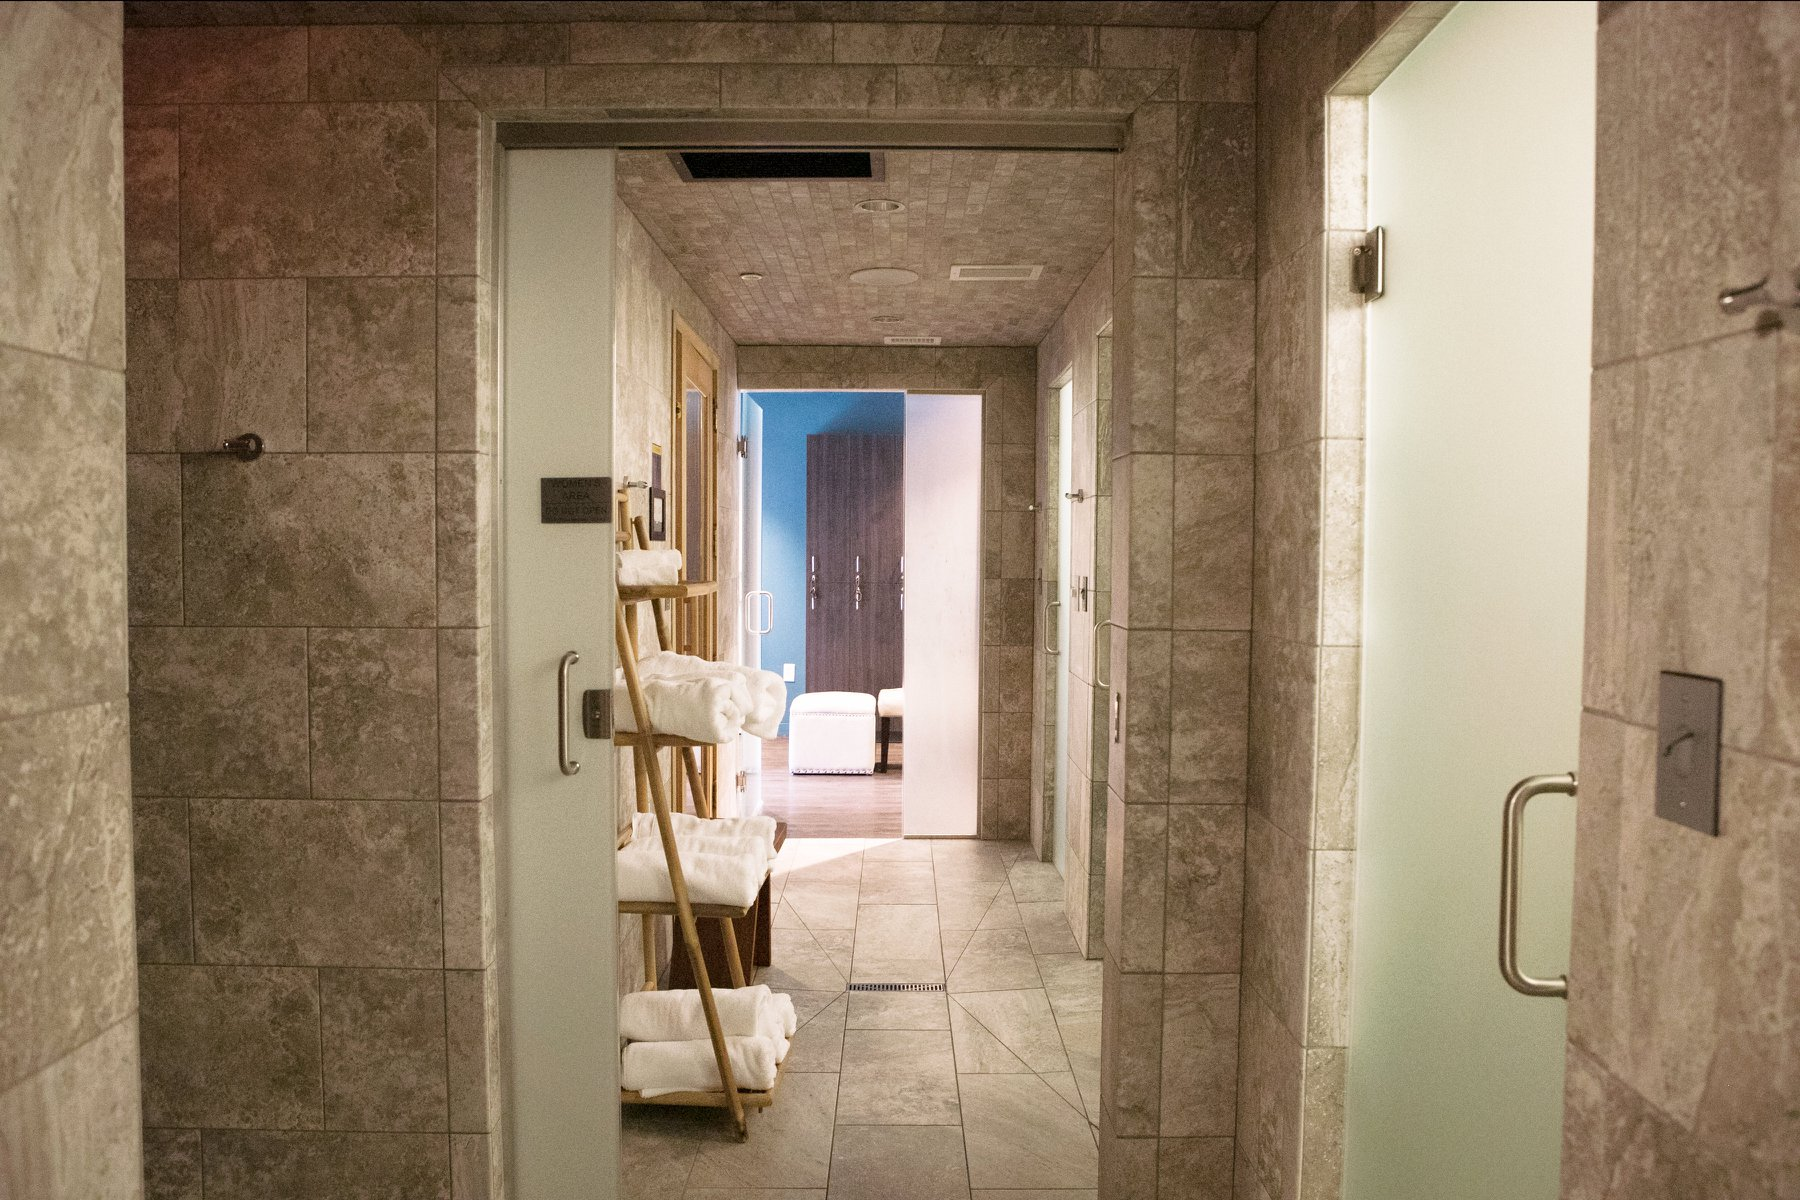 acacia spa springfield missouri steam room sauna